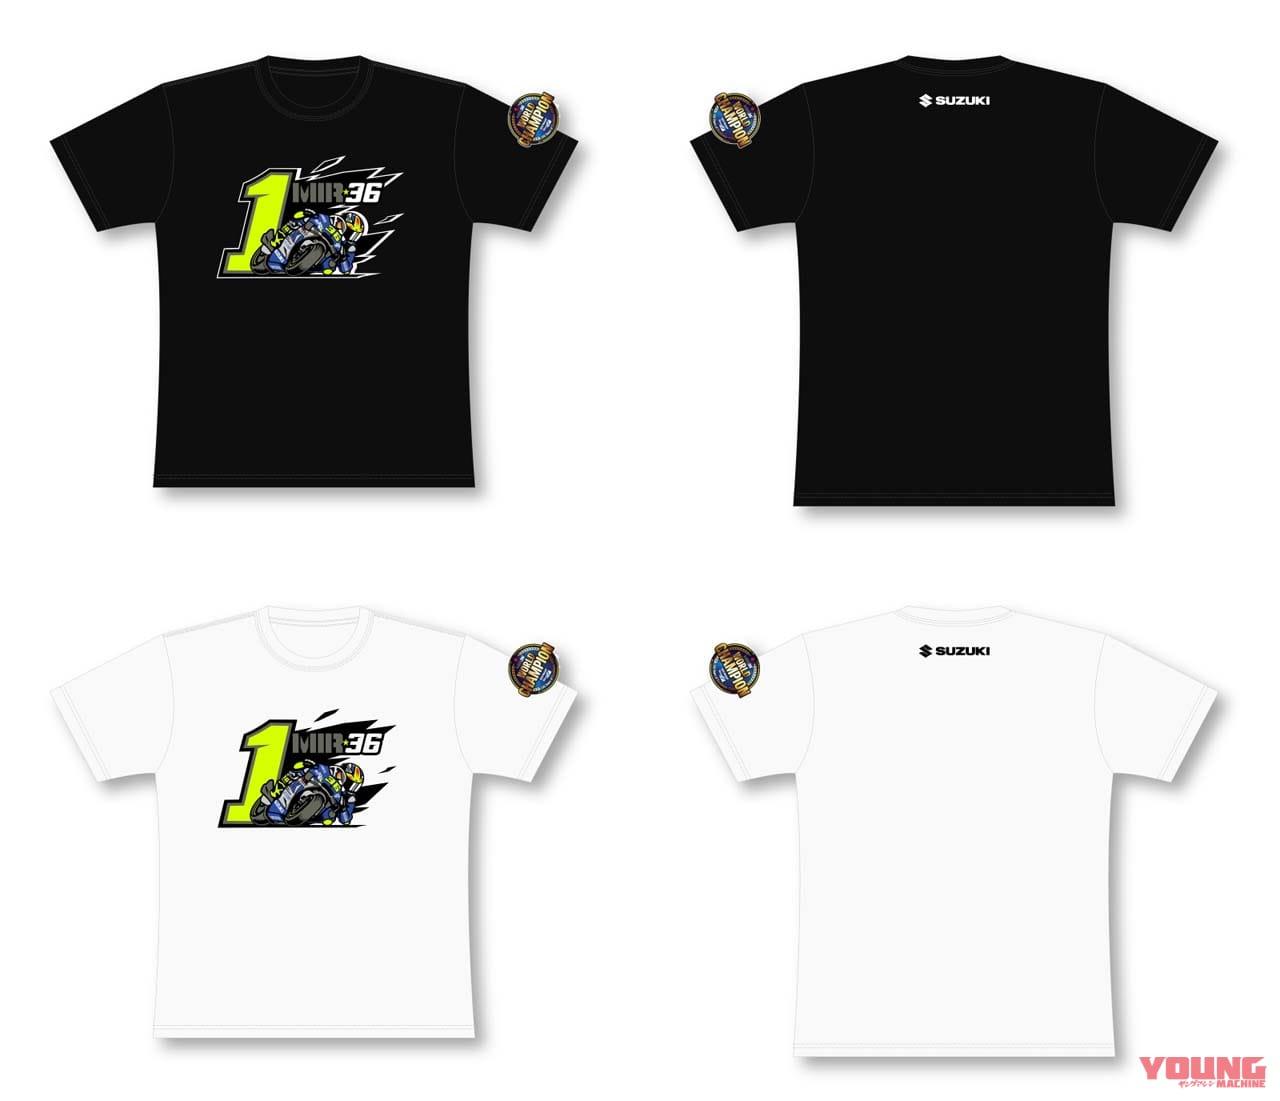 「2020 MotoGP ジョアン・ミル チャンピオングッズ」登場